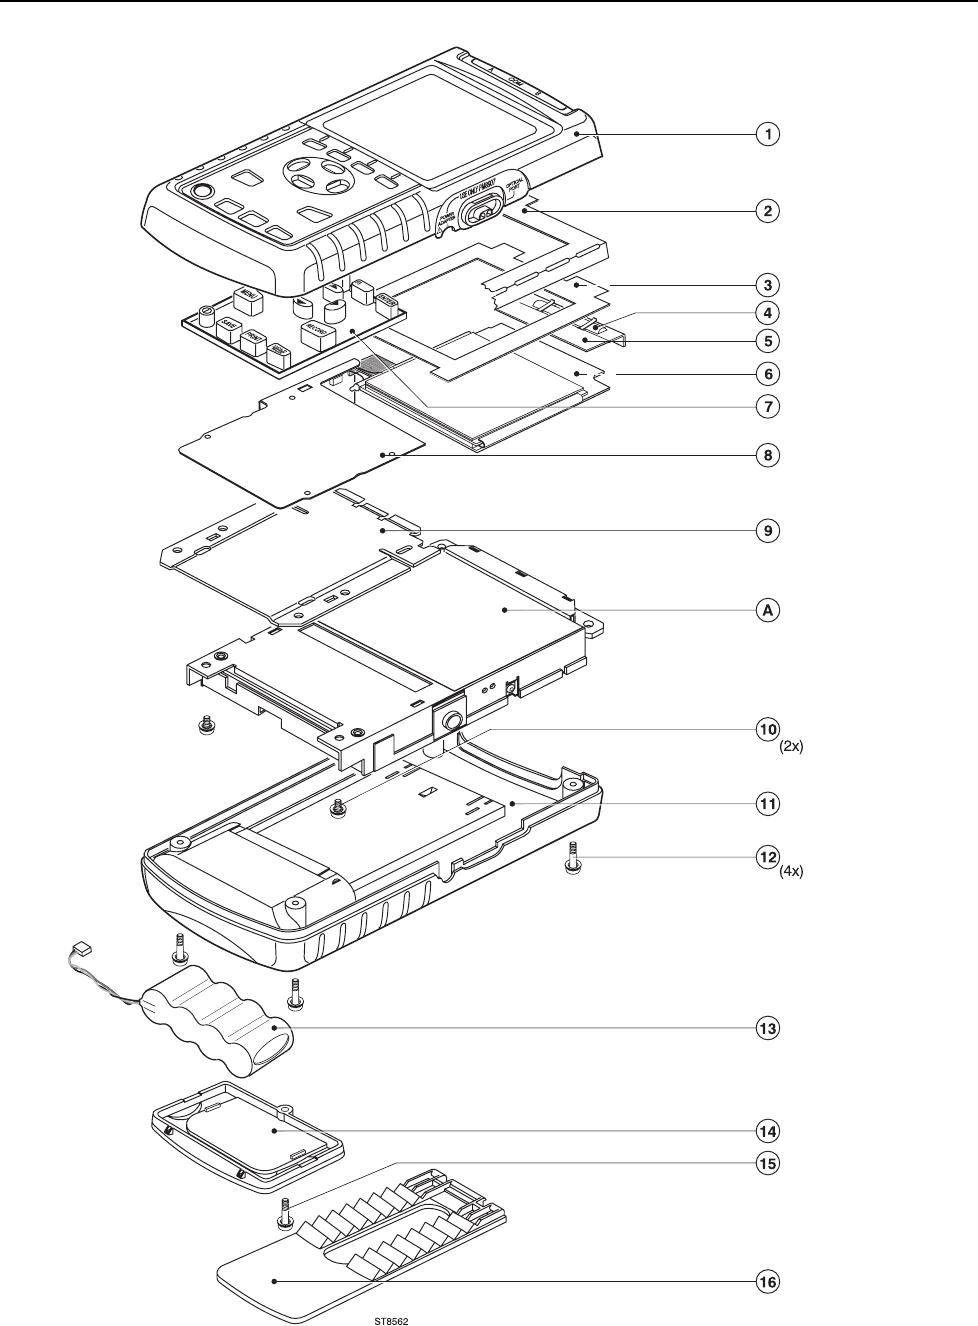 Fluke 43b Users Manual 0master 97 Spider Block Diagram Hpdeskjet300400 List Of Replaceable Parts